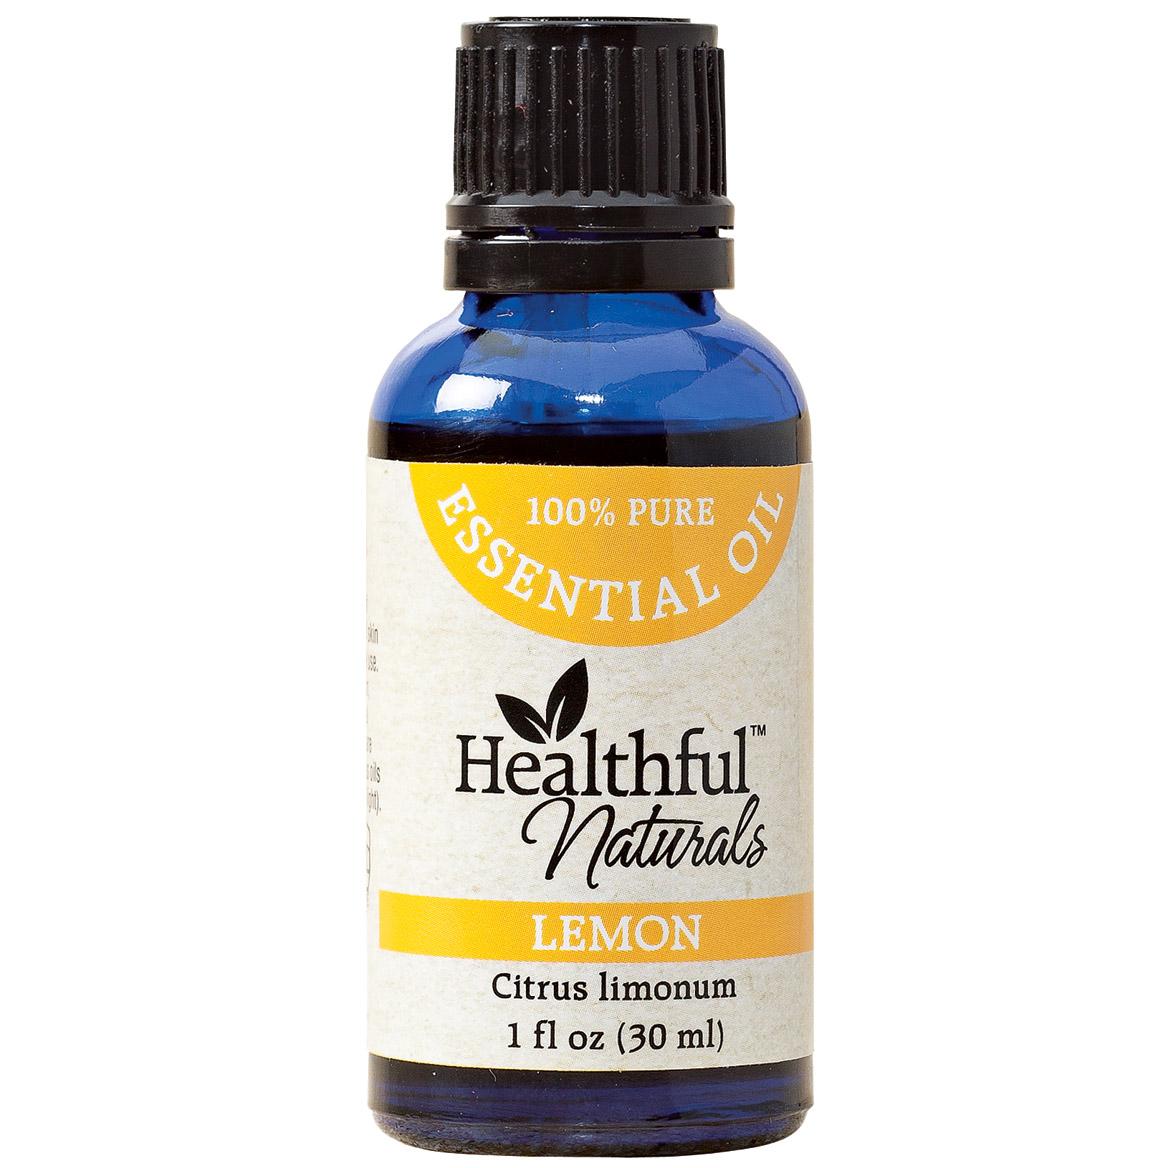 Healthful™ Naturals Lemon Essential Oil - 30 ml-353461